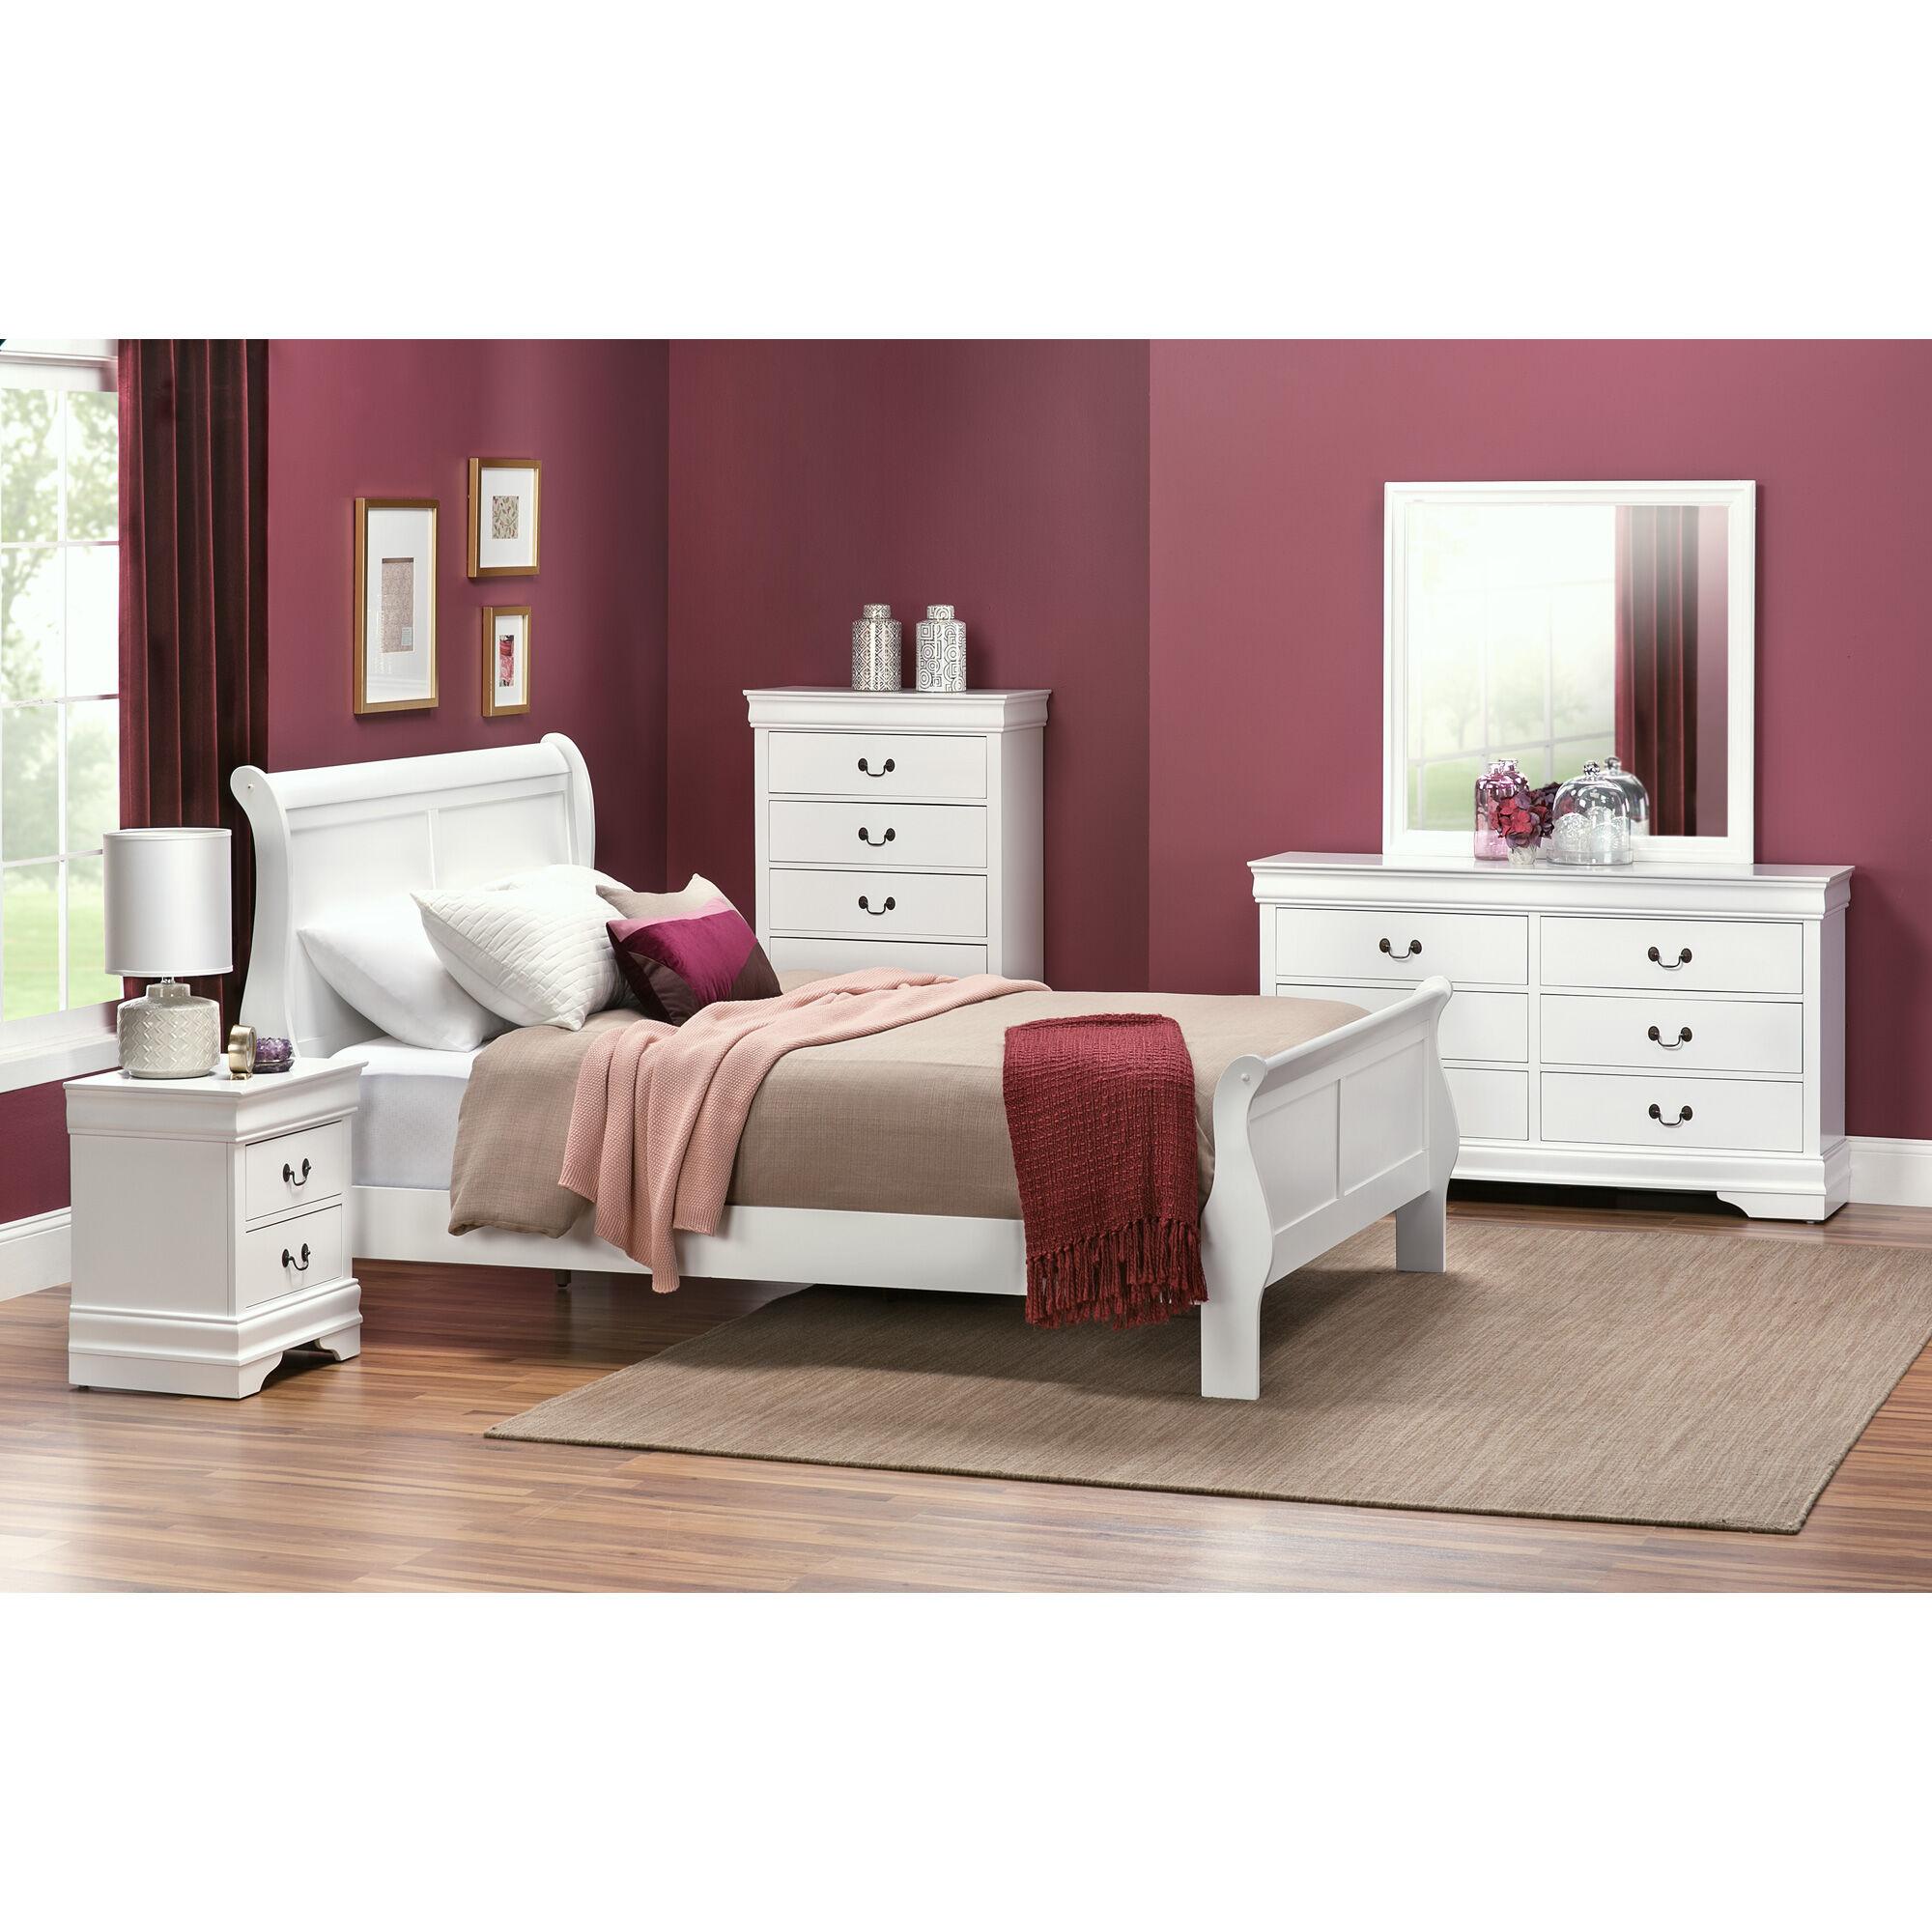 Slumberland Furniture | Yorkshire White 4 Piece Queen Package